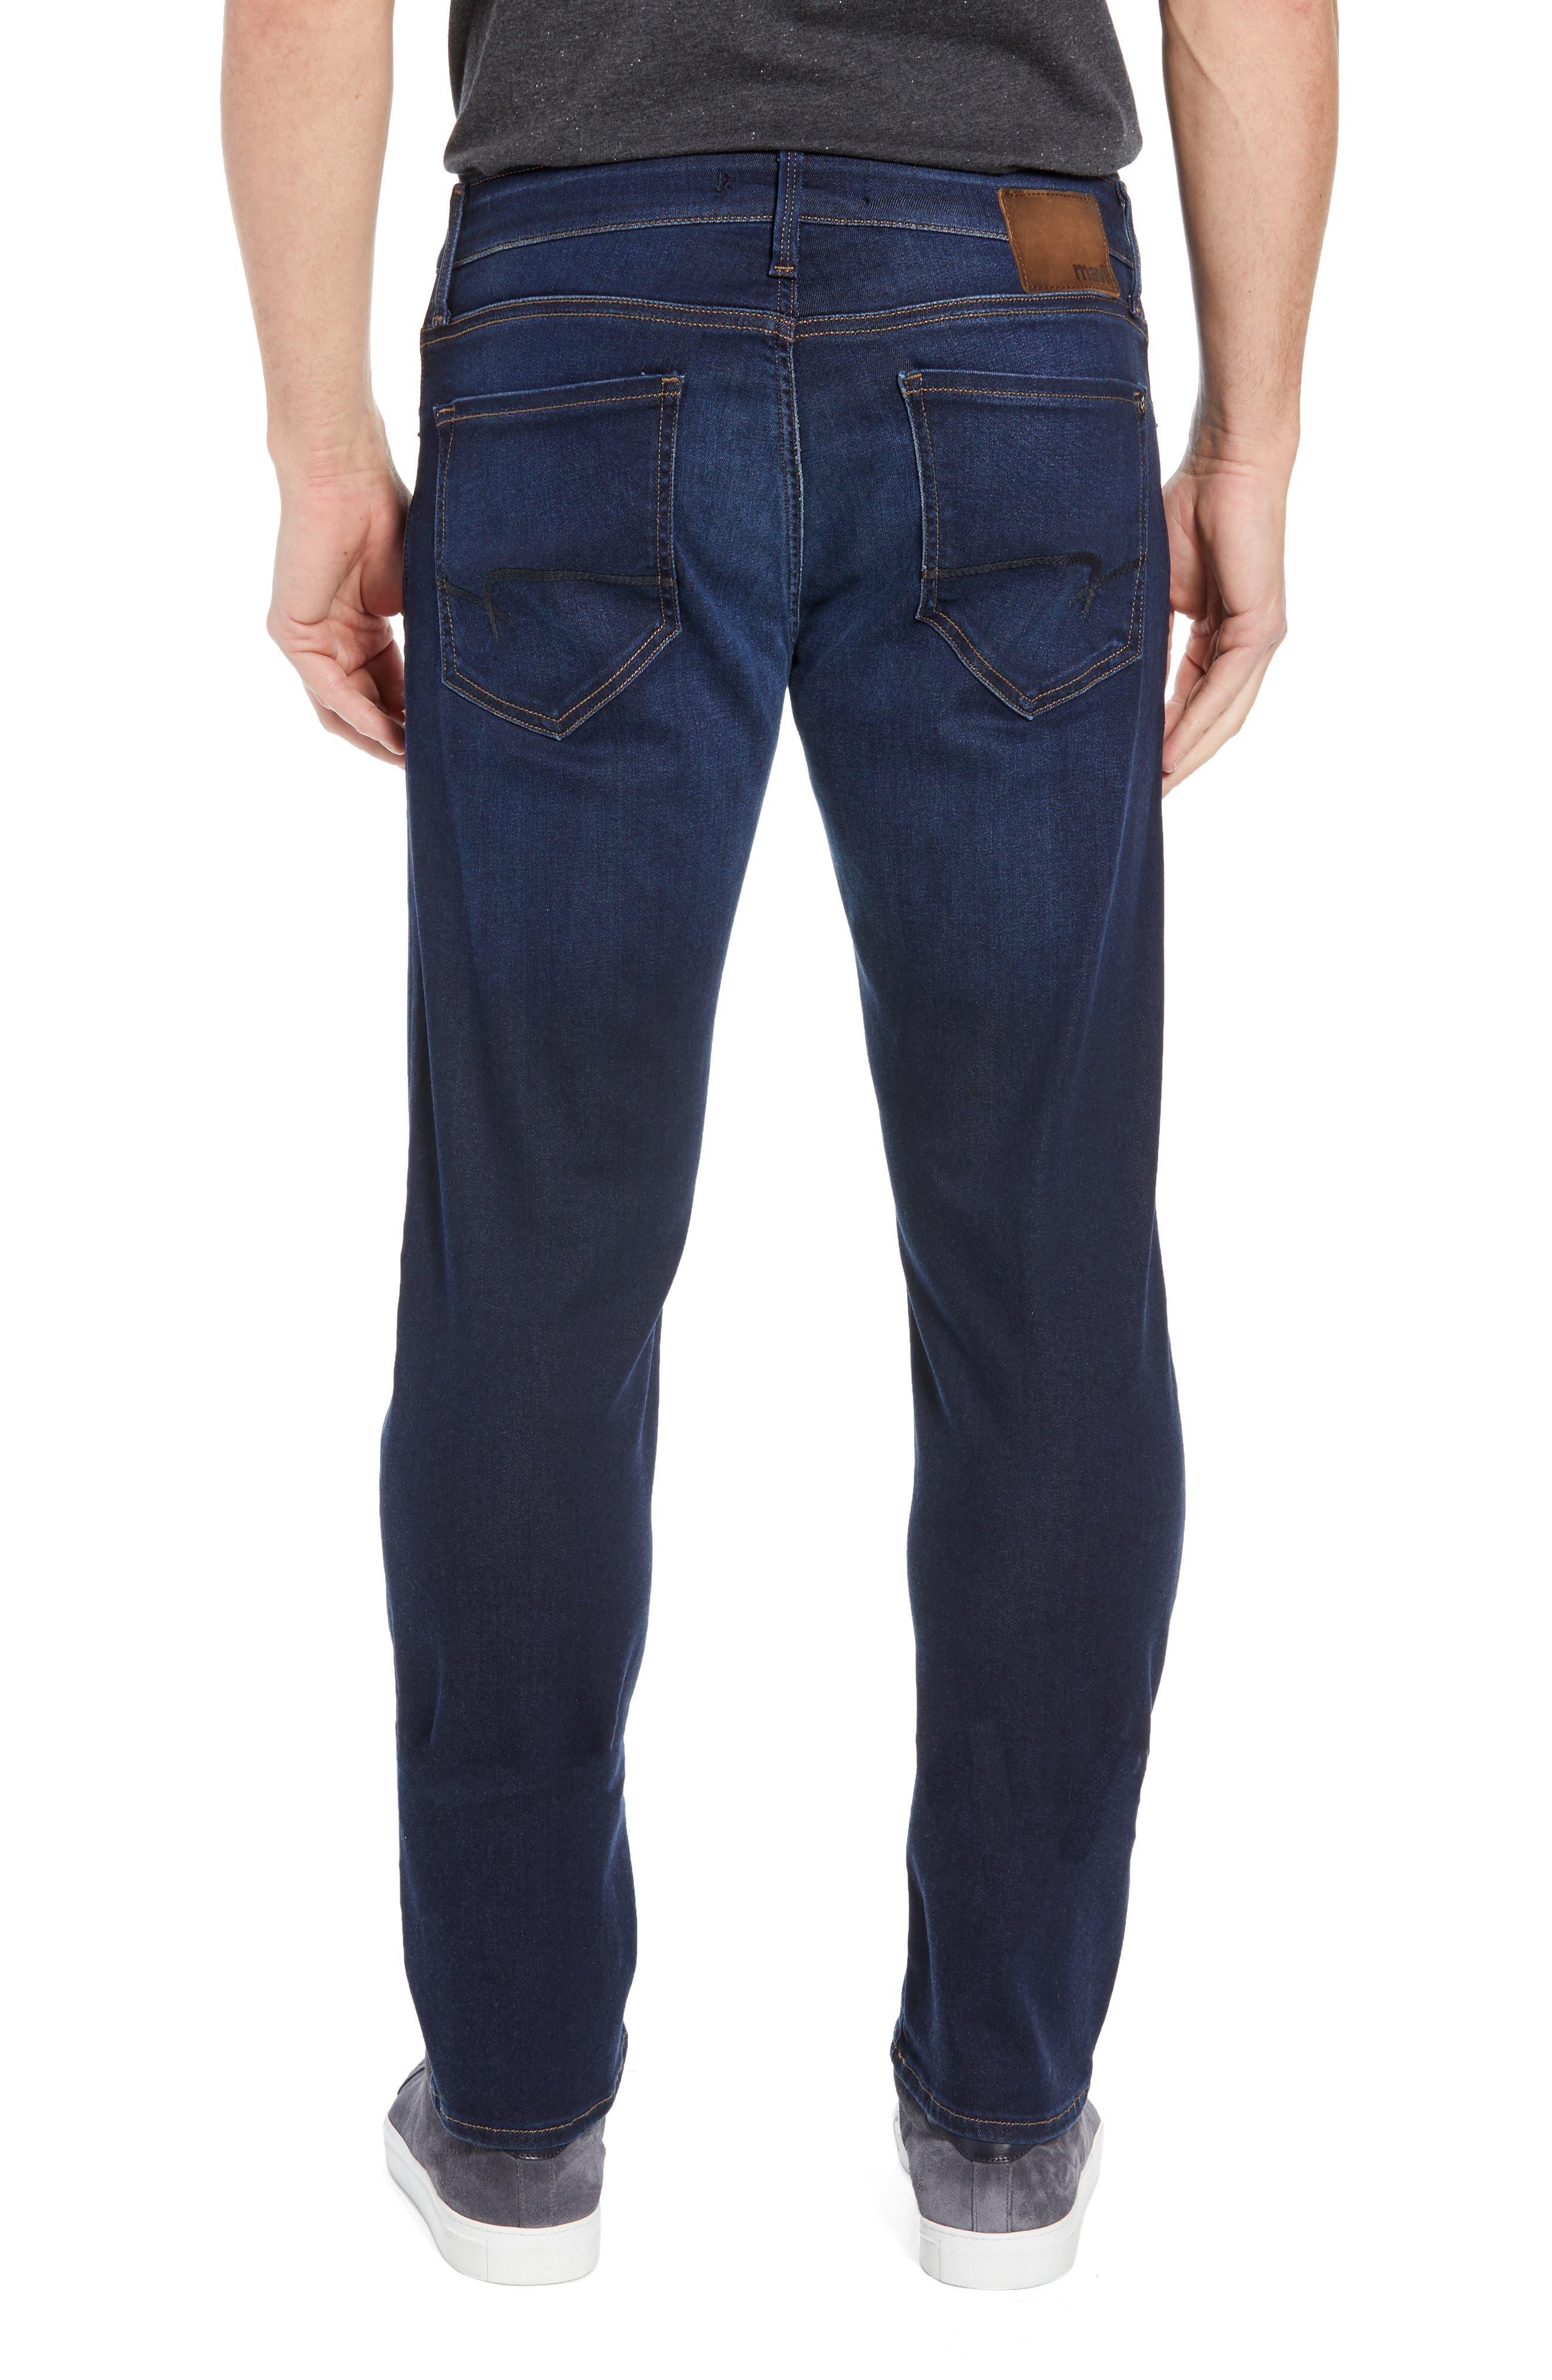 Zach Straight Leg Jeans,                             Alternate thumbnail 2, color,                             DEEP SOFT MOVE